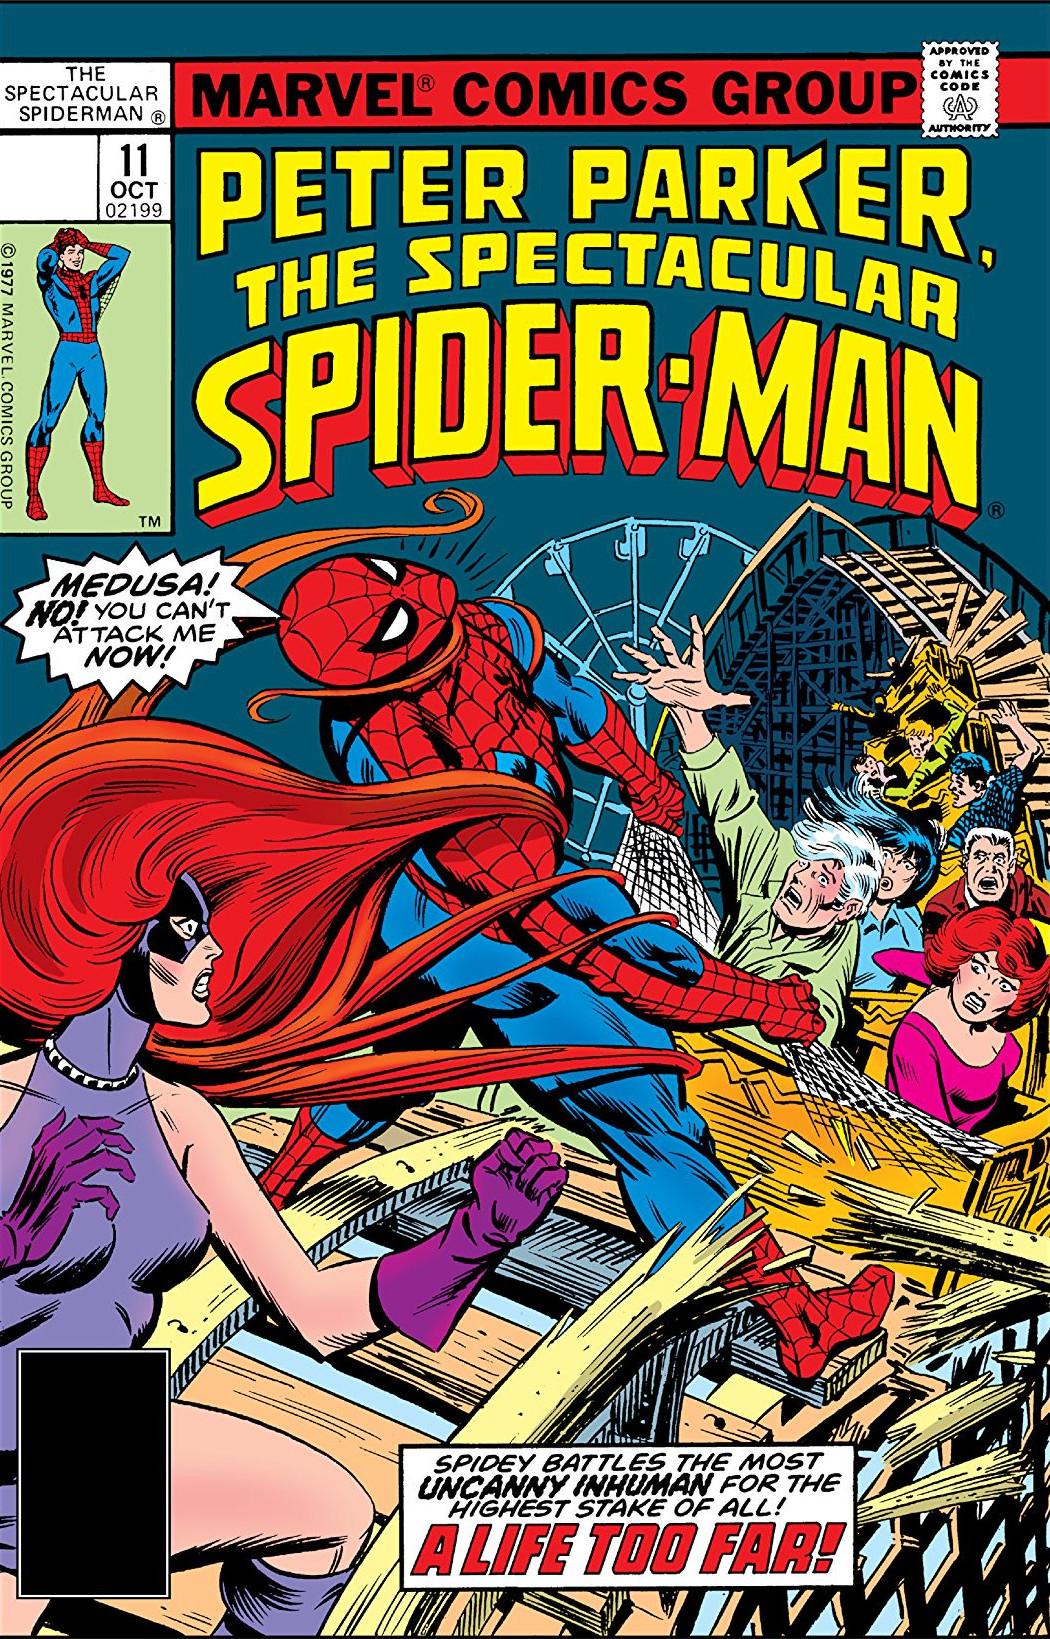 Peter Parker, The Spectacular Spider-Man Vol 1 11